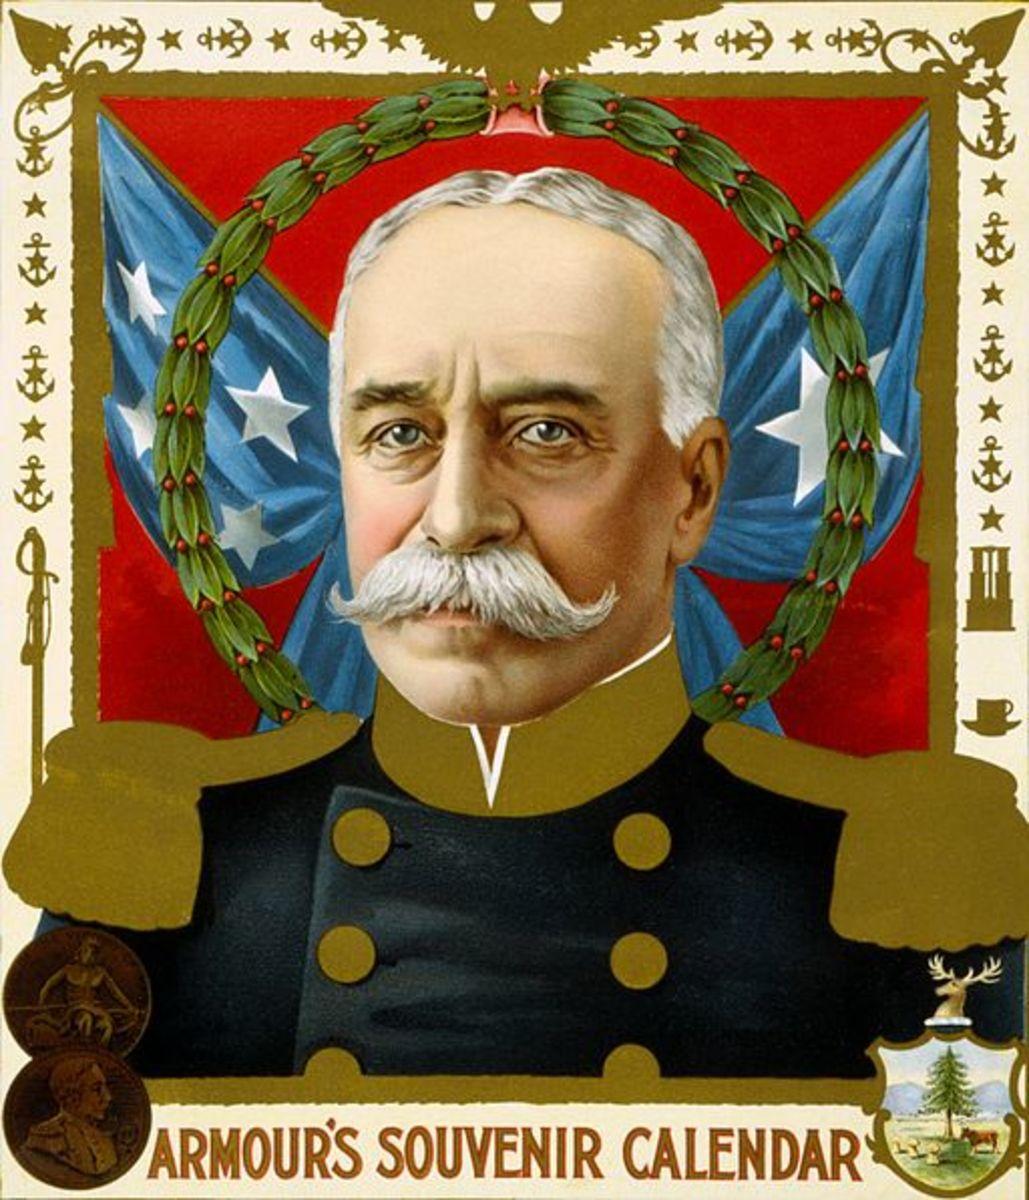 Souvenir calendar featuring Admiral George Dewey, 1899